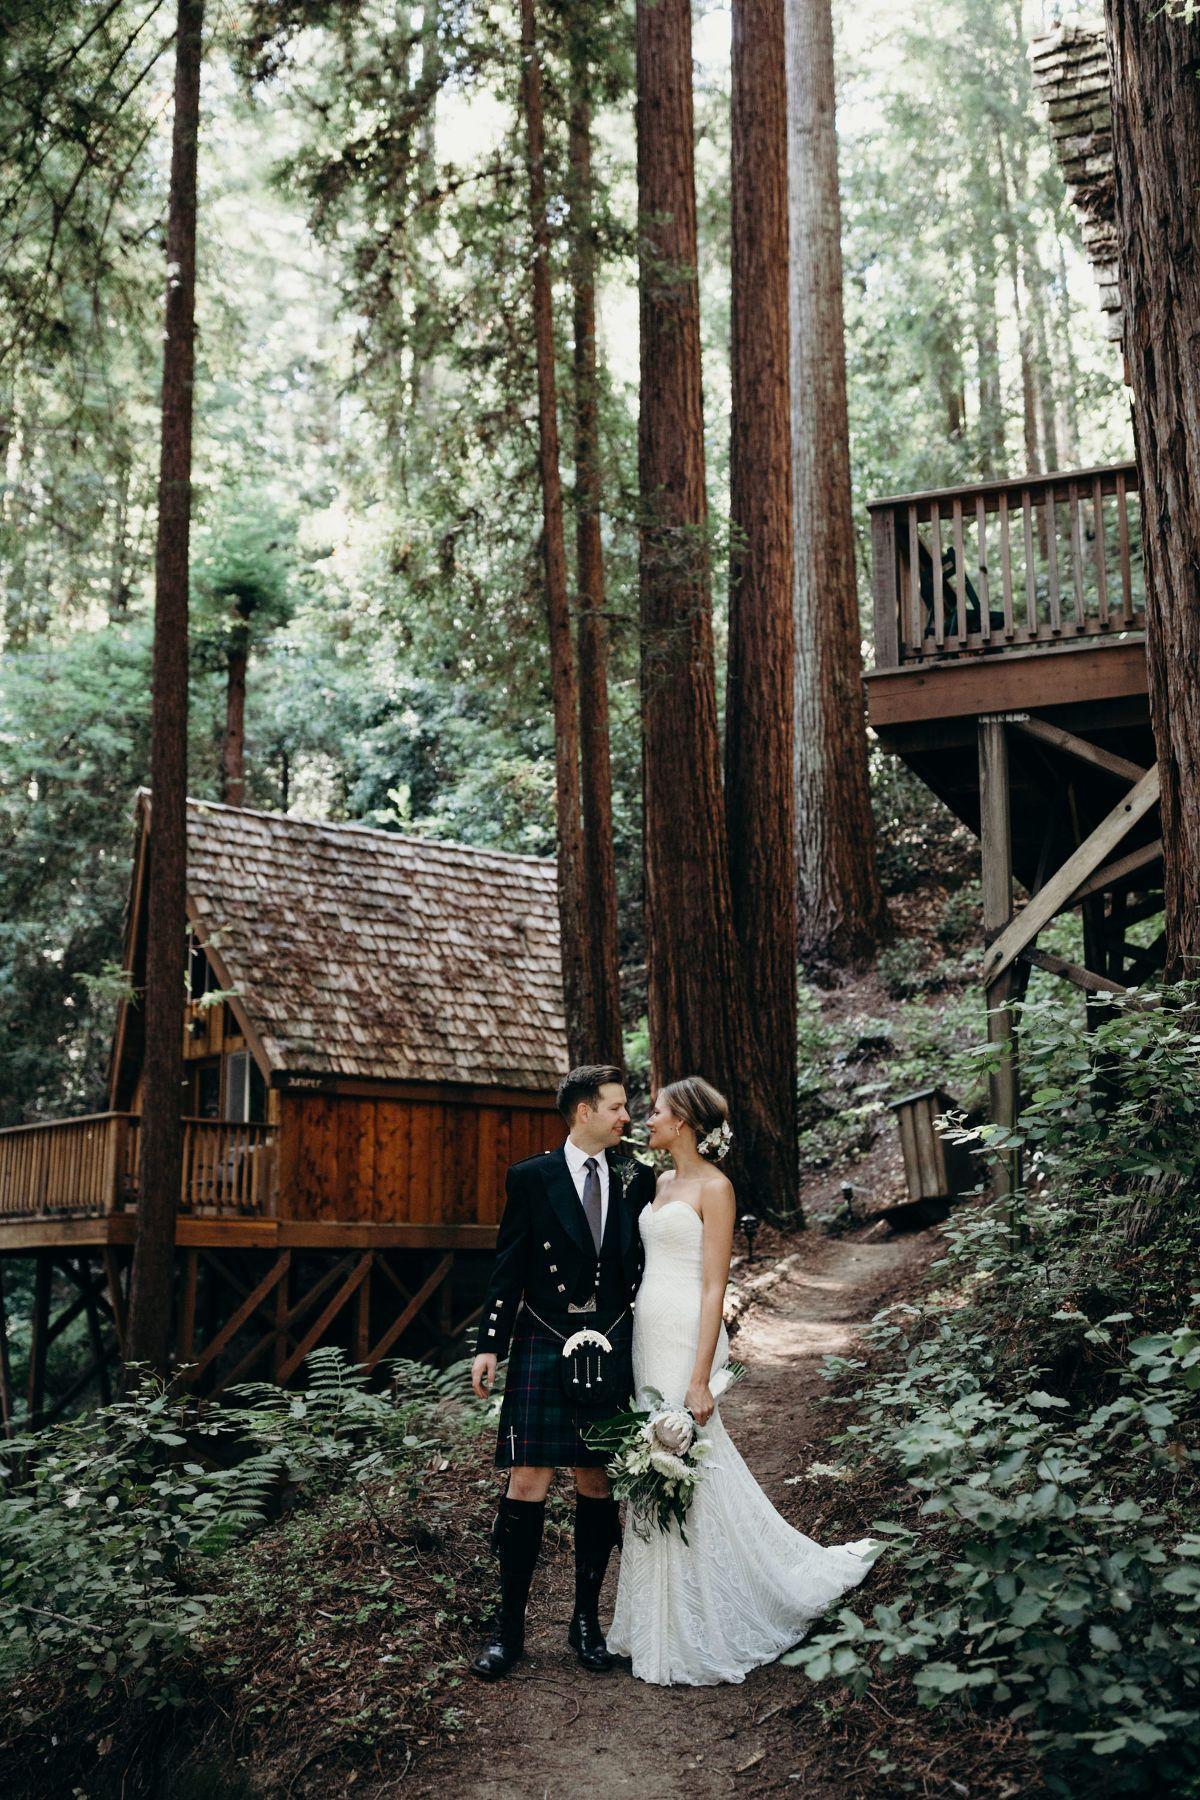 Waterfall Lodge And Retreat Weddings In Ben Lomond California Santa Cruz Mountains Wedding Venue Wedding Locations California Santa Cruz Mountains Wedding Forest Wedding Venue